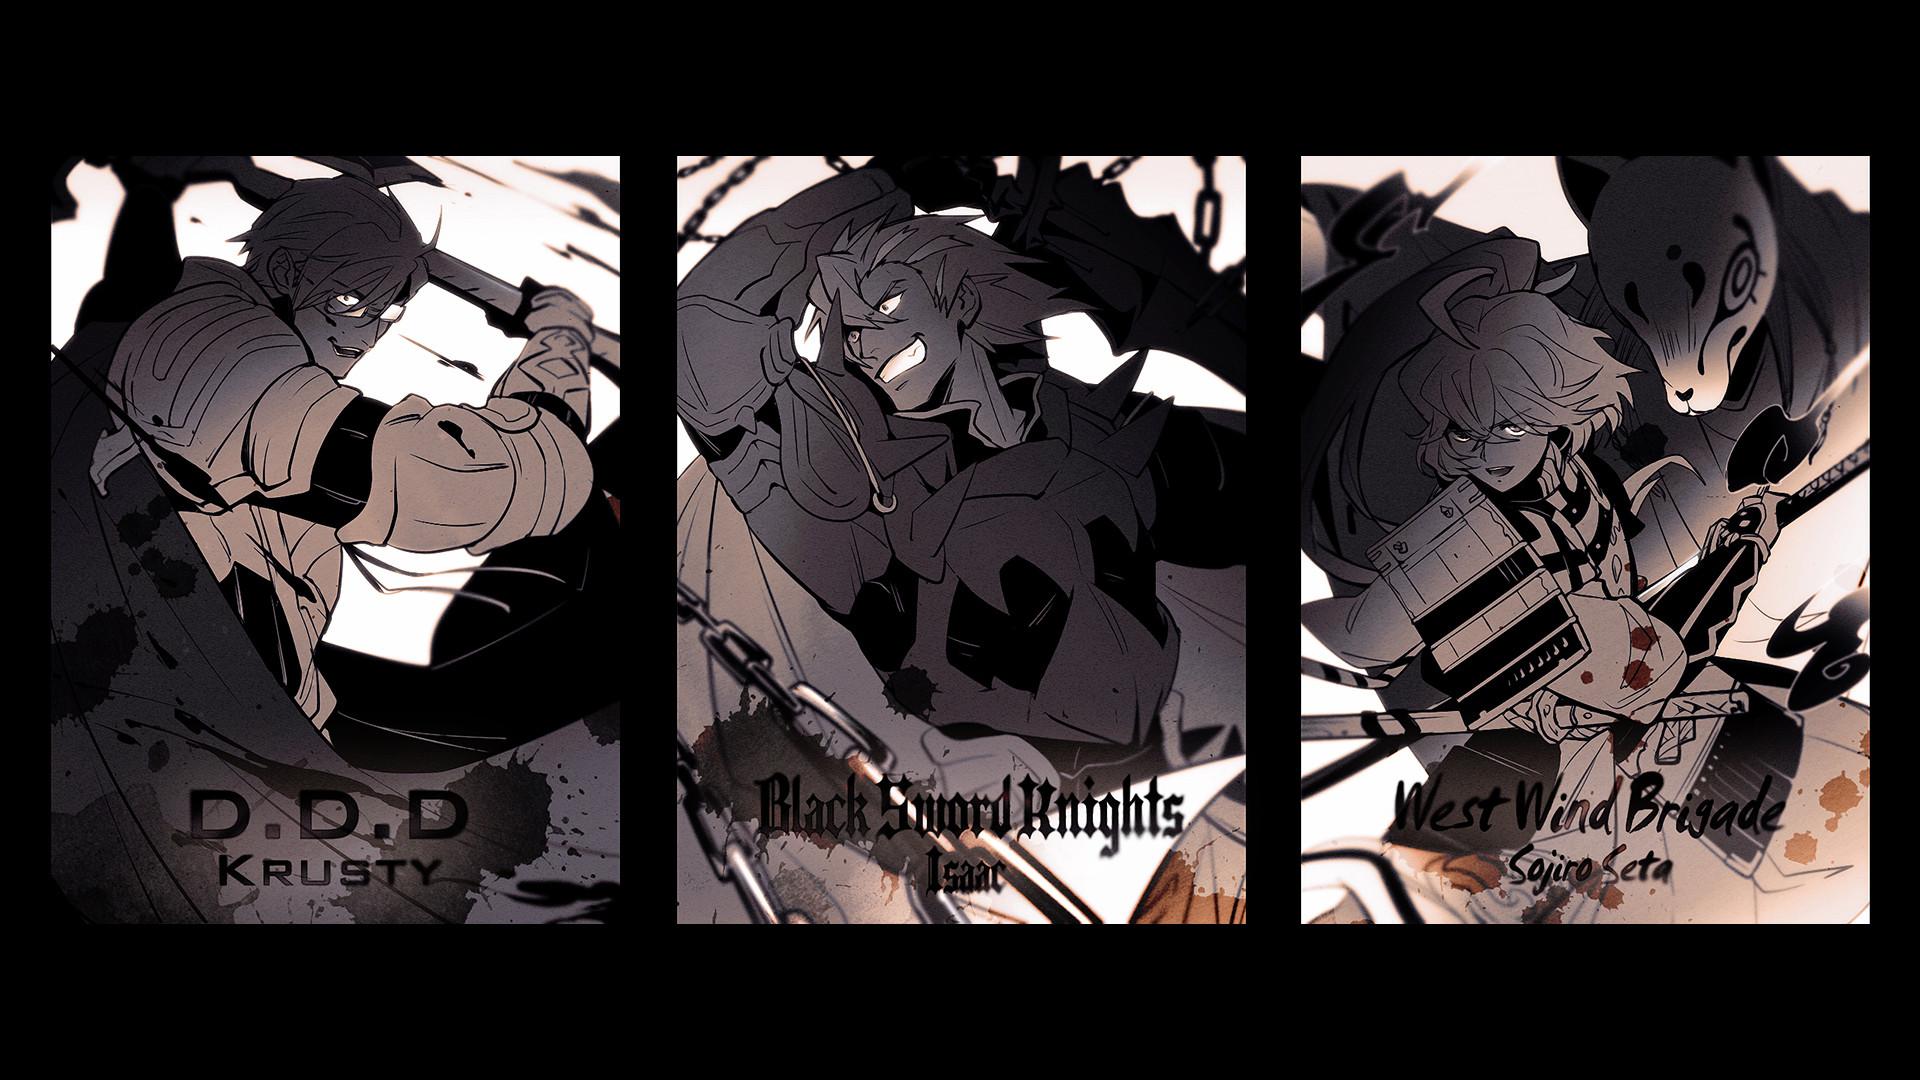 Krusty Isaac Soujiro 3z HD Wallpaper. Anime & Manga + Log Horizon